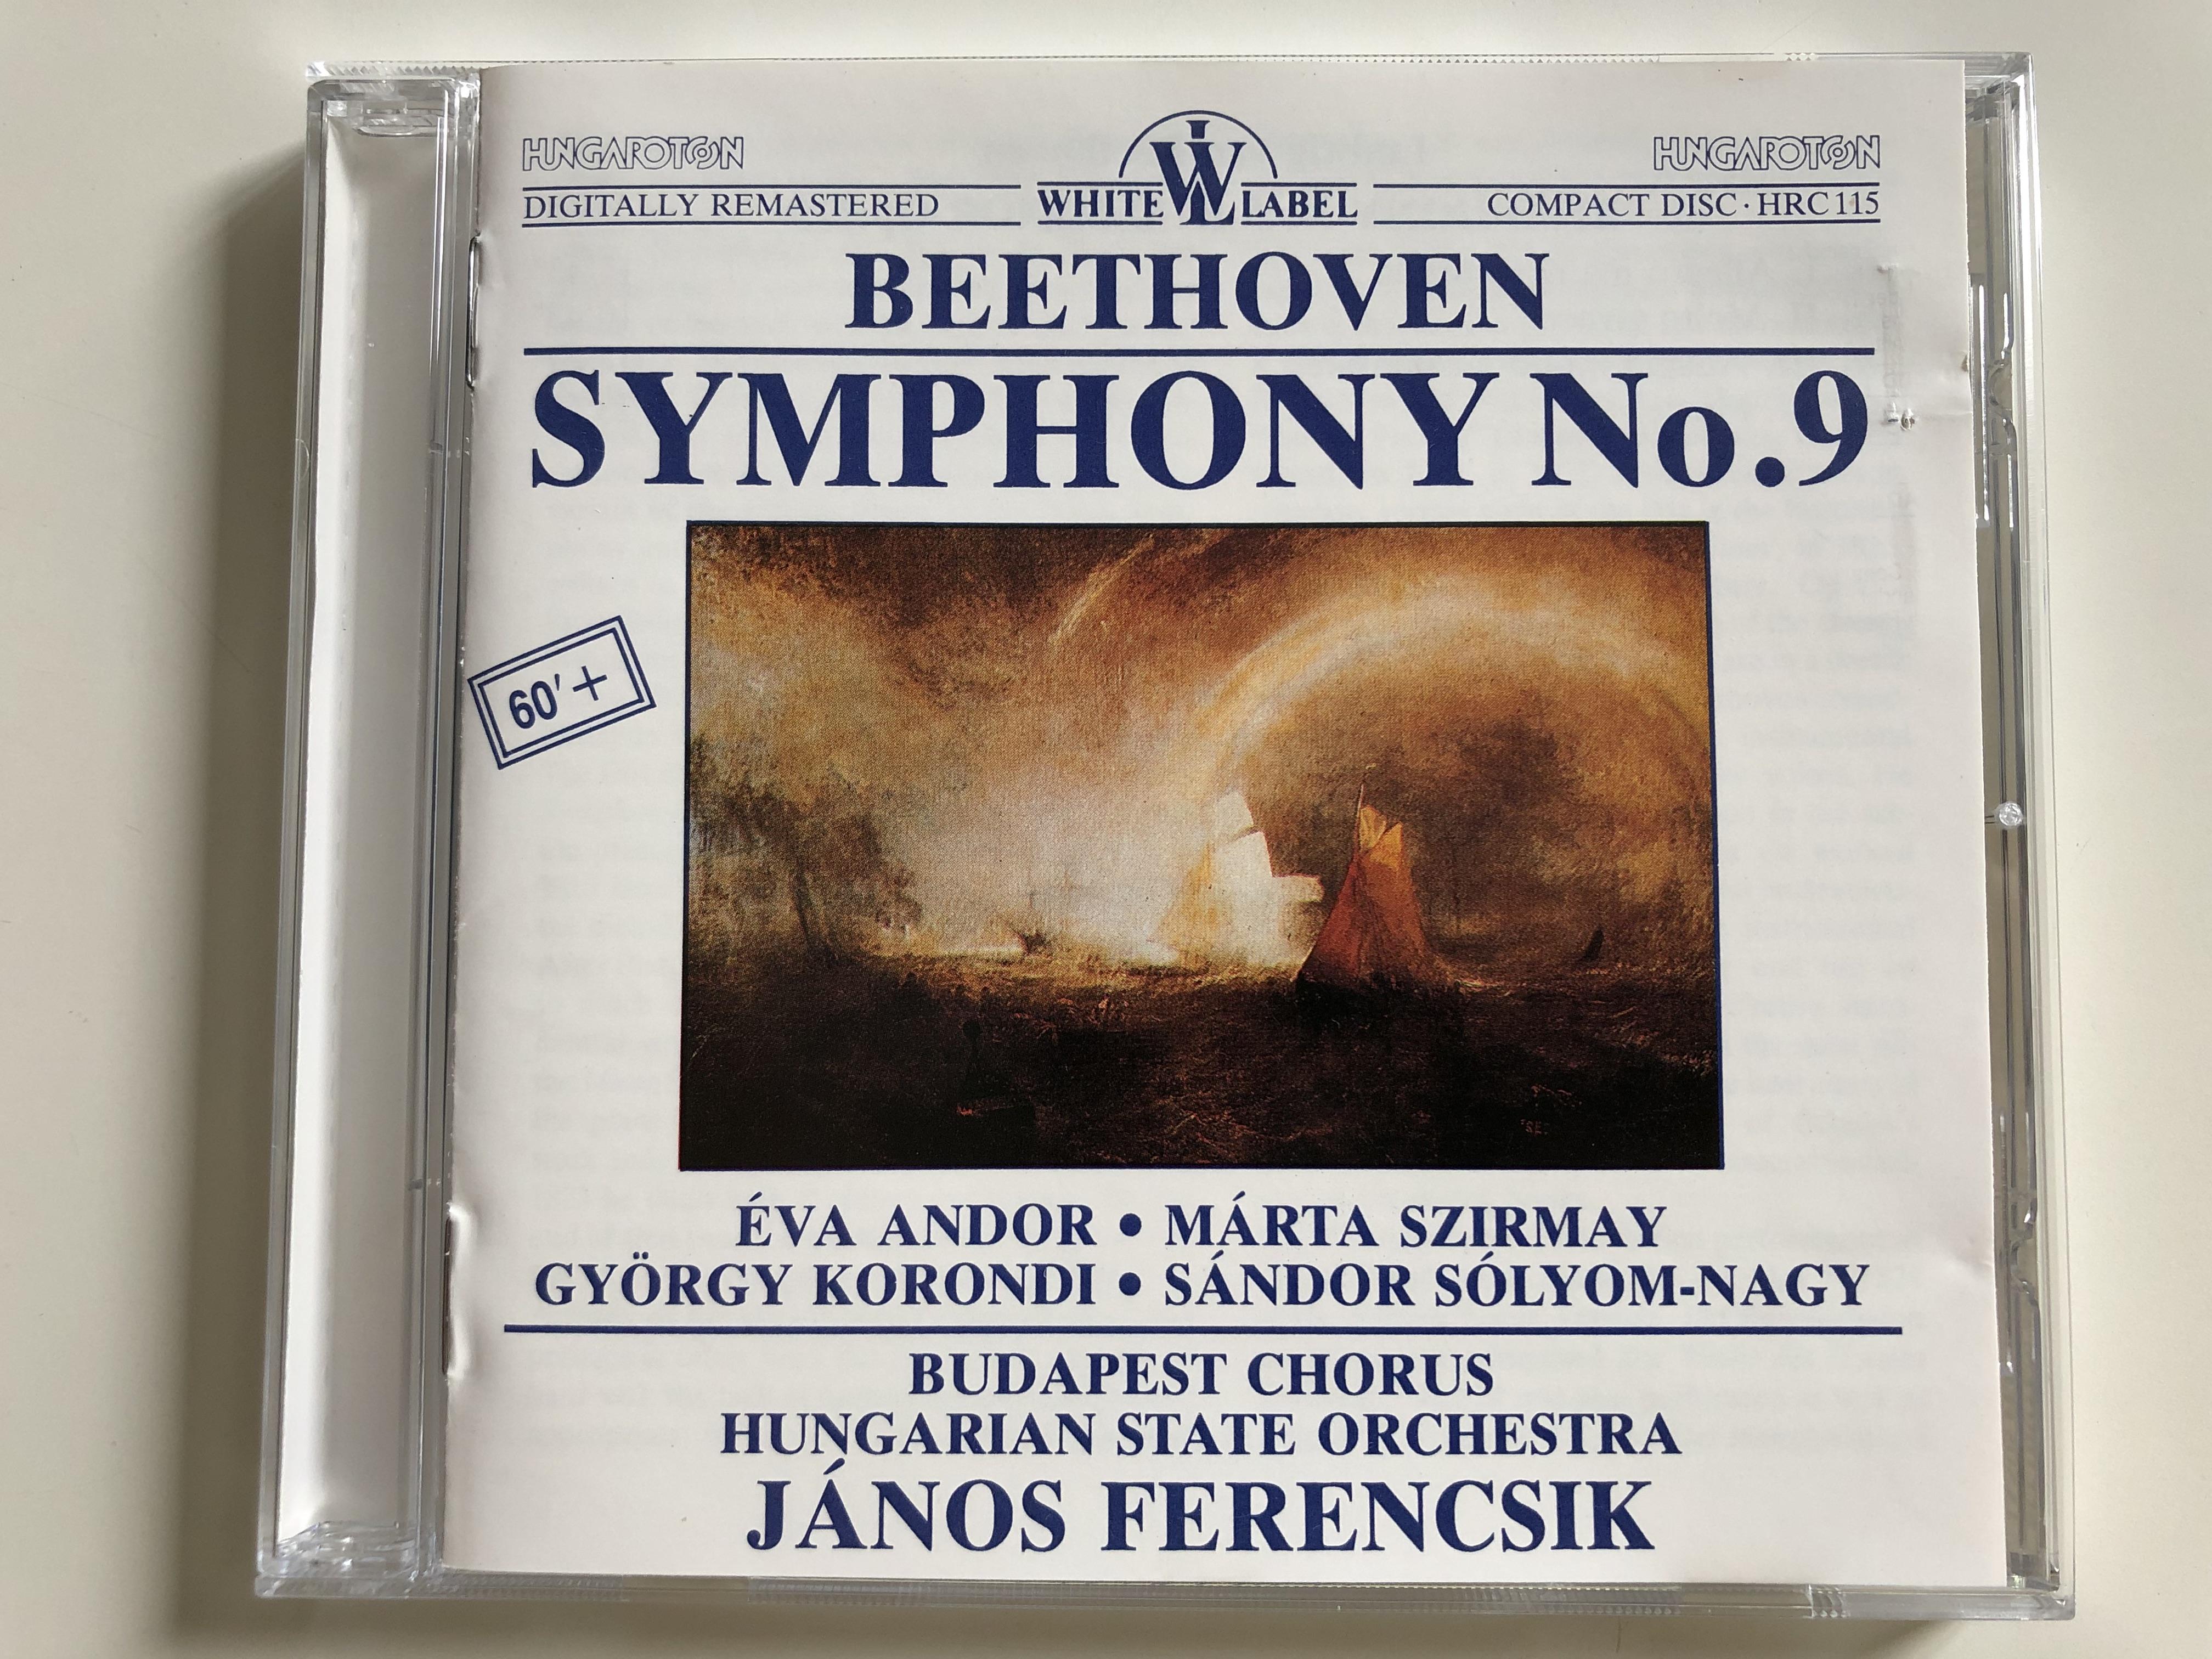 beethoven-symphony-no.-9-va-andor-m-rta-szirmay-gy-rgy-korondi-s-ndor-s-lyom-nagy-budapest-chorus-hungarian-state-orchestra-conducted-by-j-nos-ferencsik-hungaroton-white-label-audio-cd-1988-hrc-115-1-.jpg